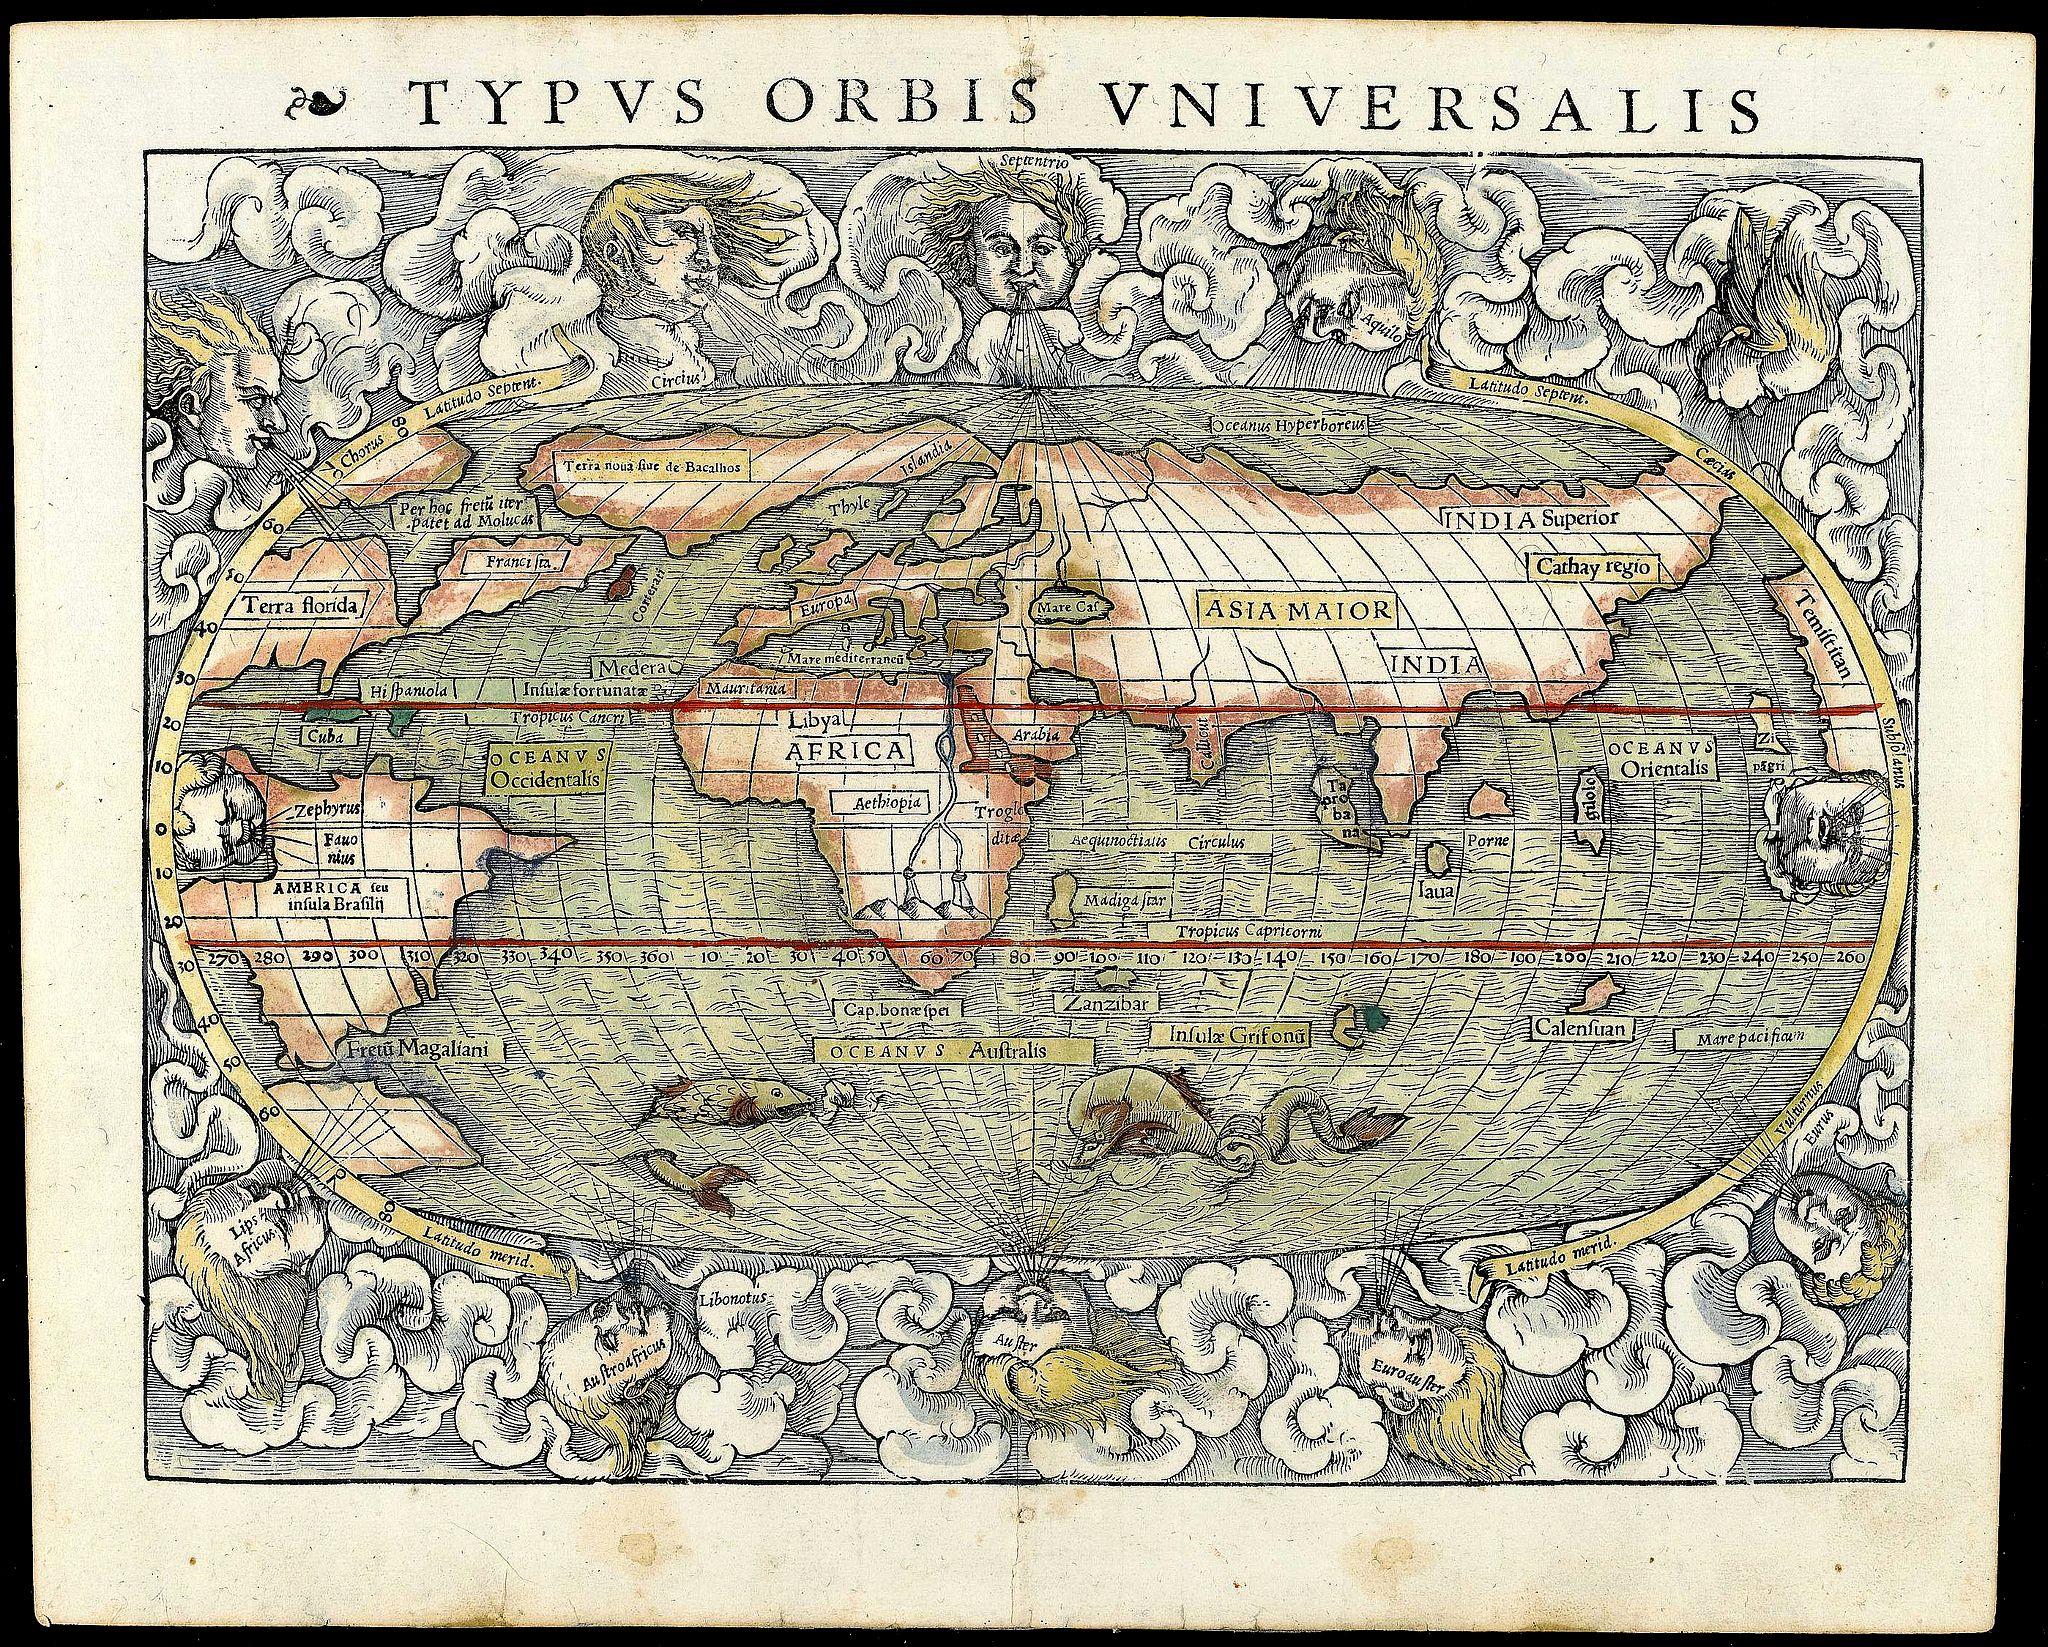 M�NSTER, S. - Typus Orbis Universalis.